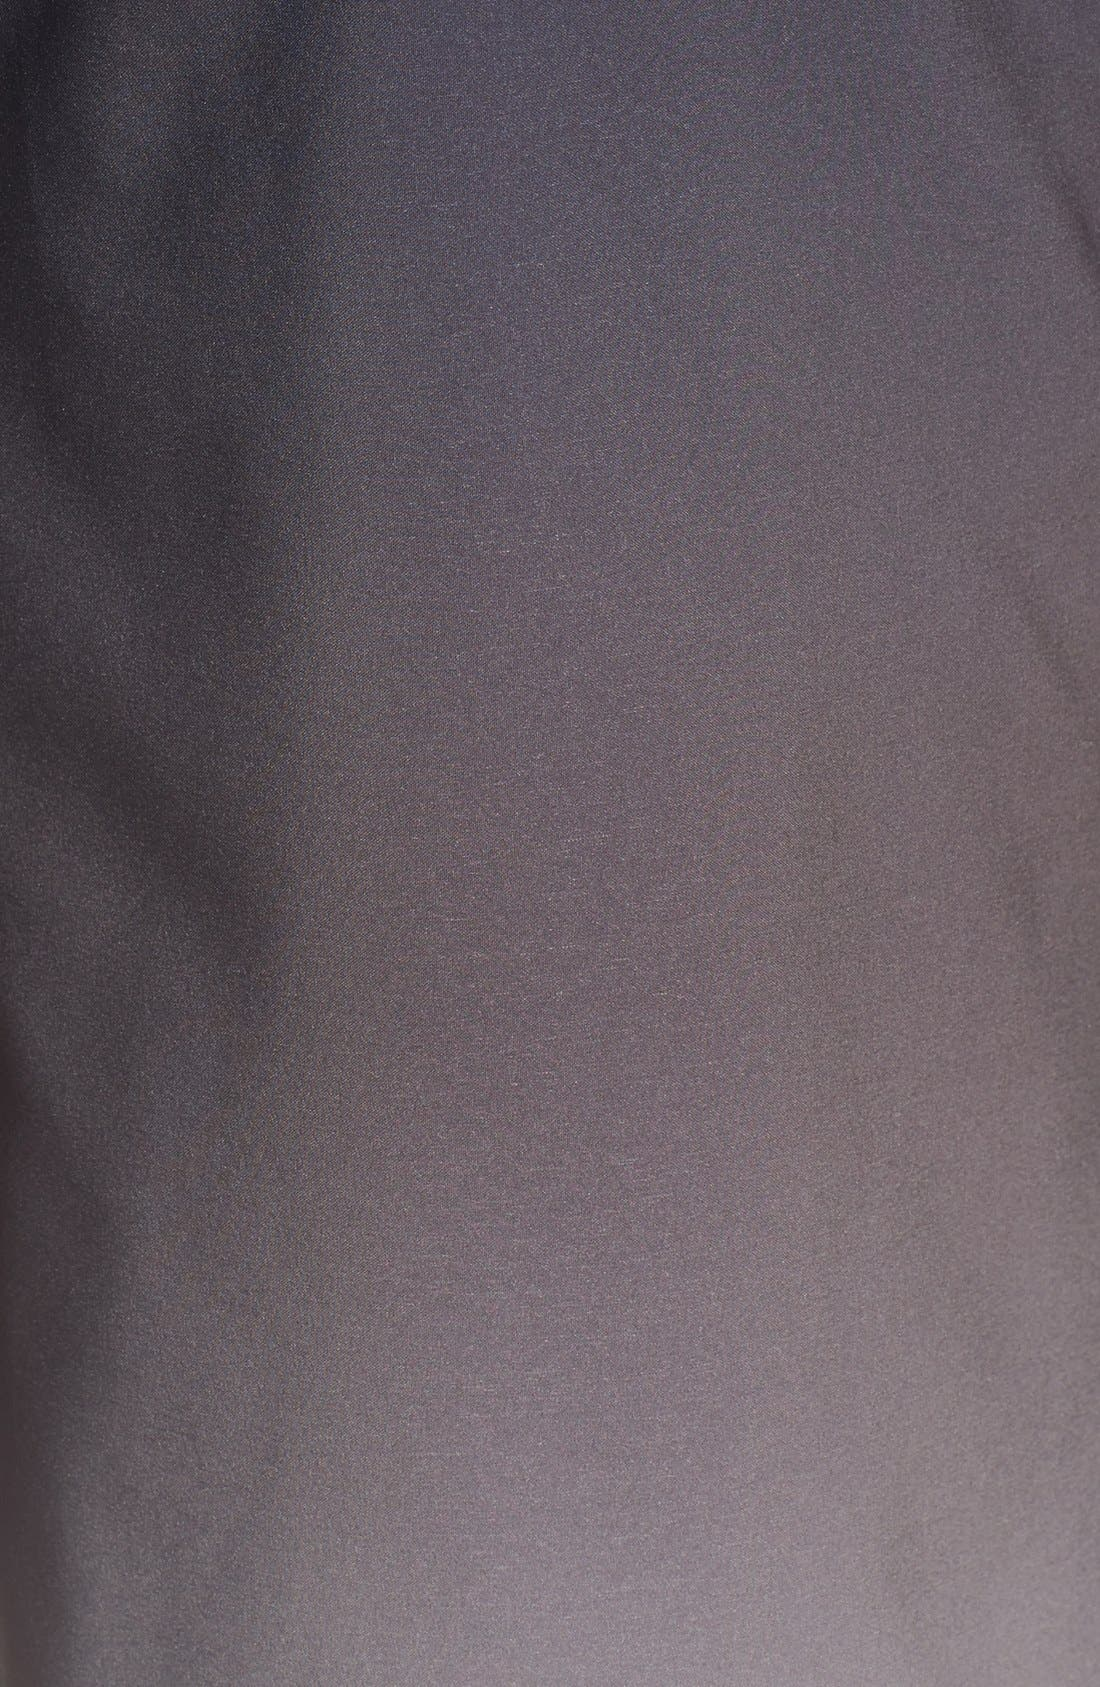 Alternate Image 3  - Hurley 'Phantom Original 2' Board Shorts (Online Only)